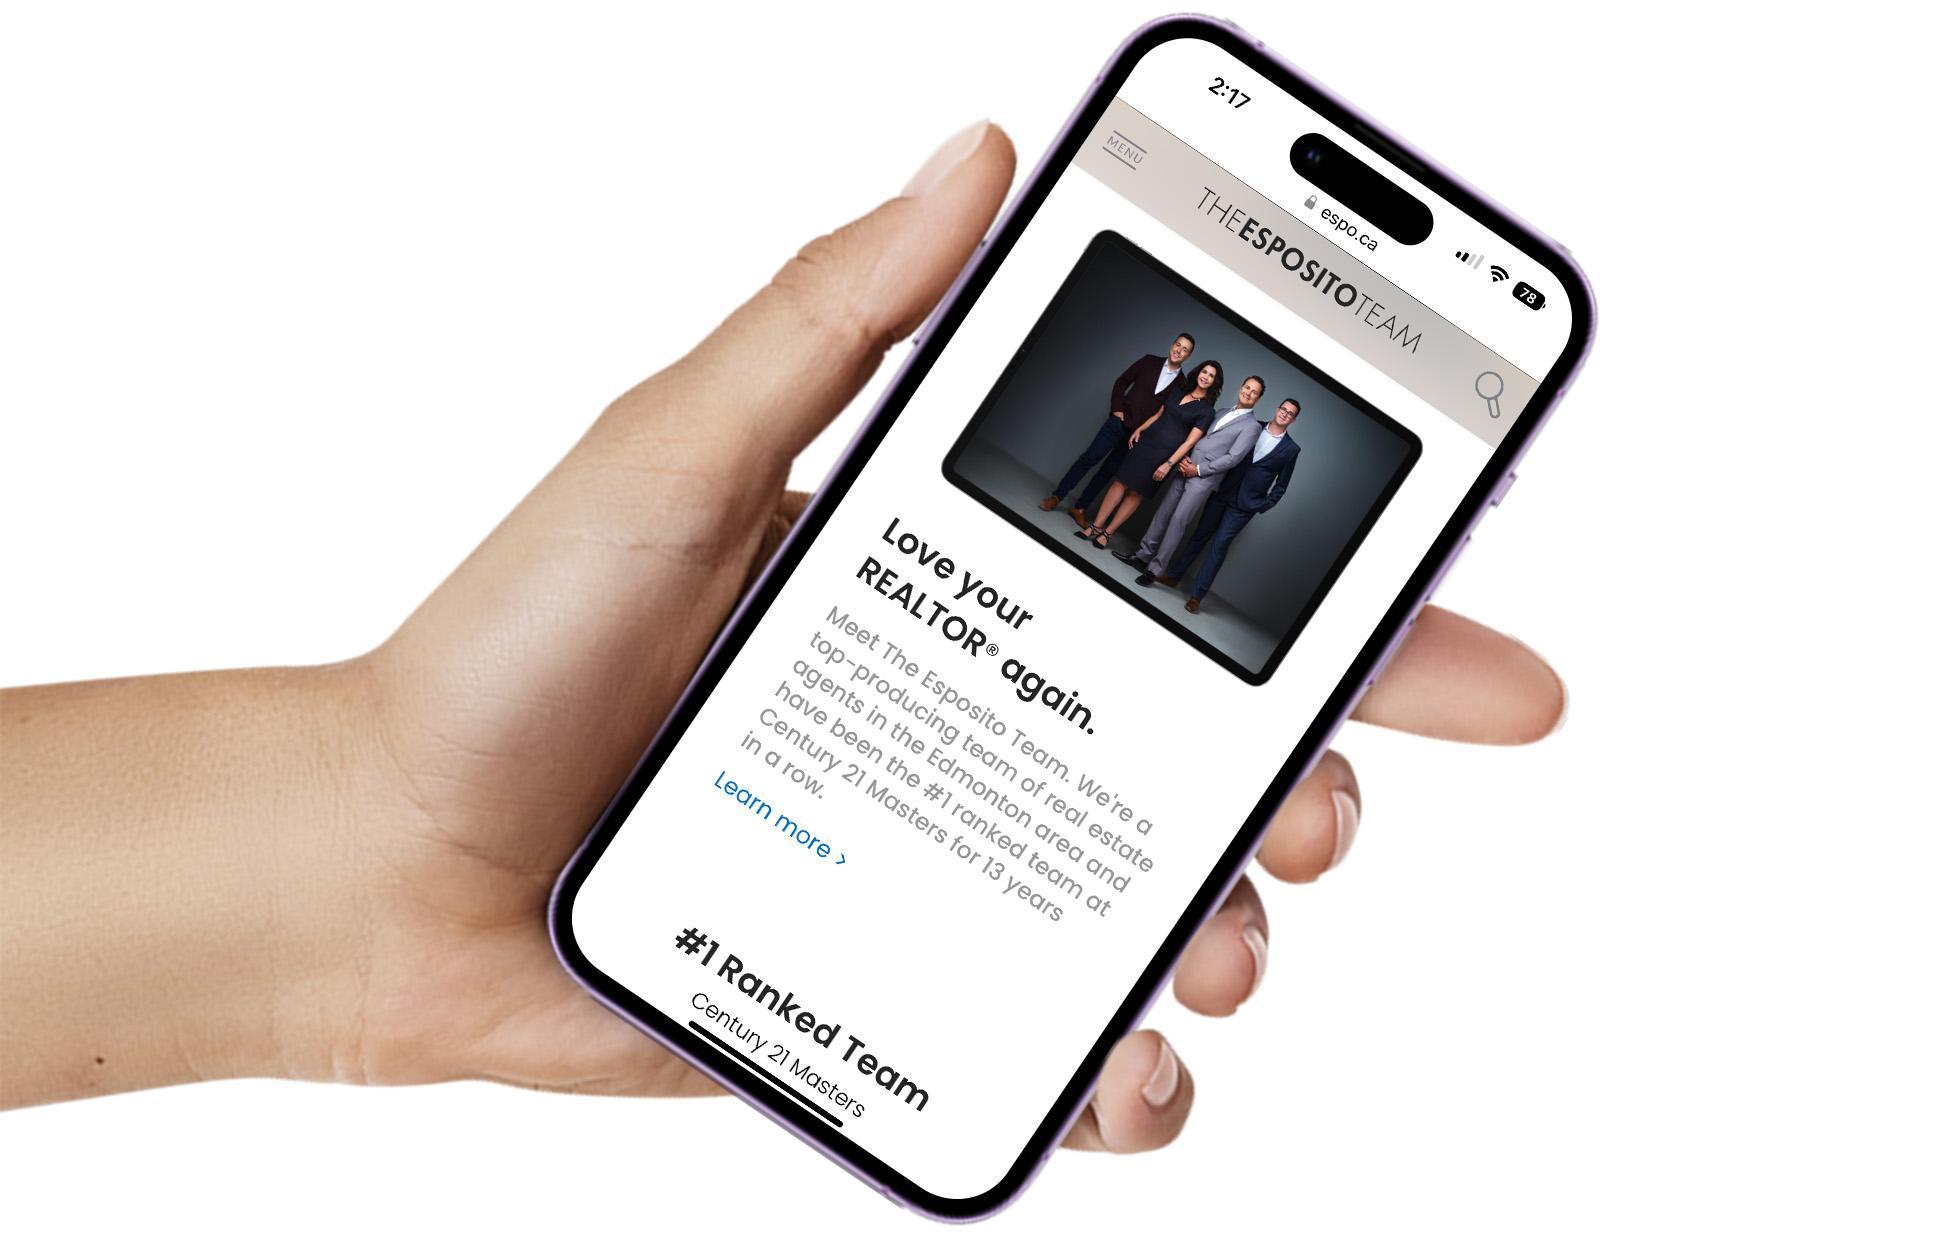 ESPO.ca homepage displayed on smartphone